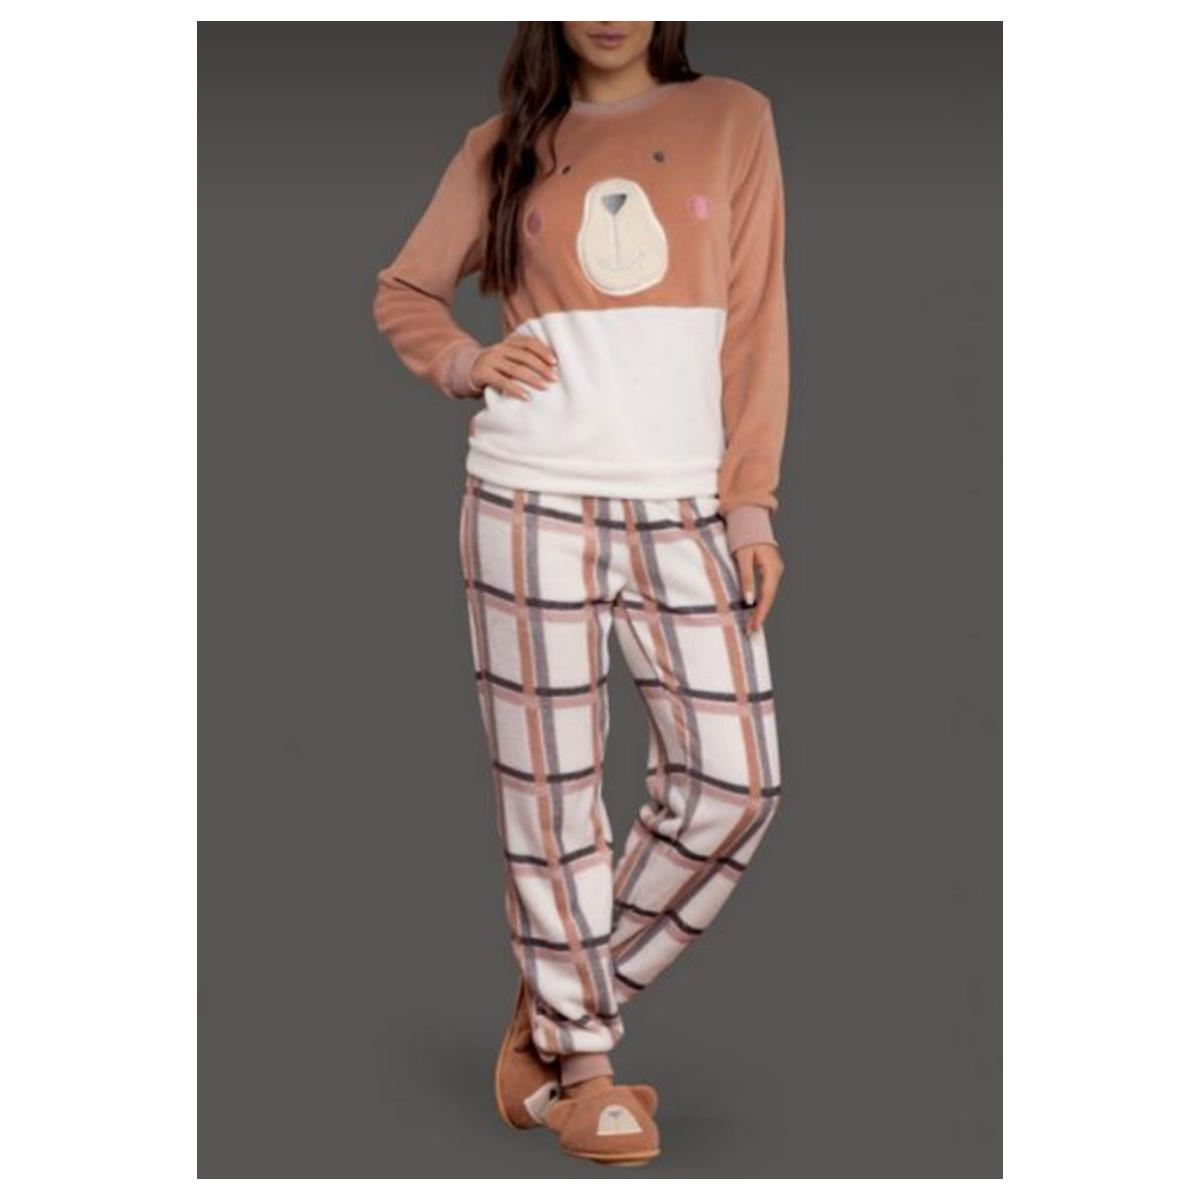 Pijama Feminina Lua Lua 120275 Marrom/off White